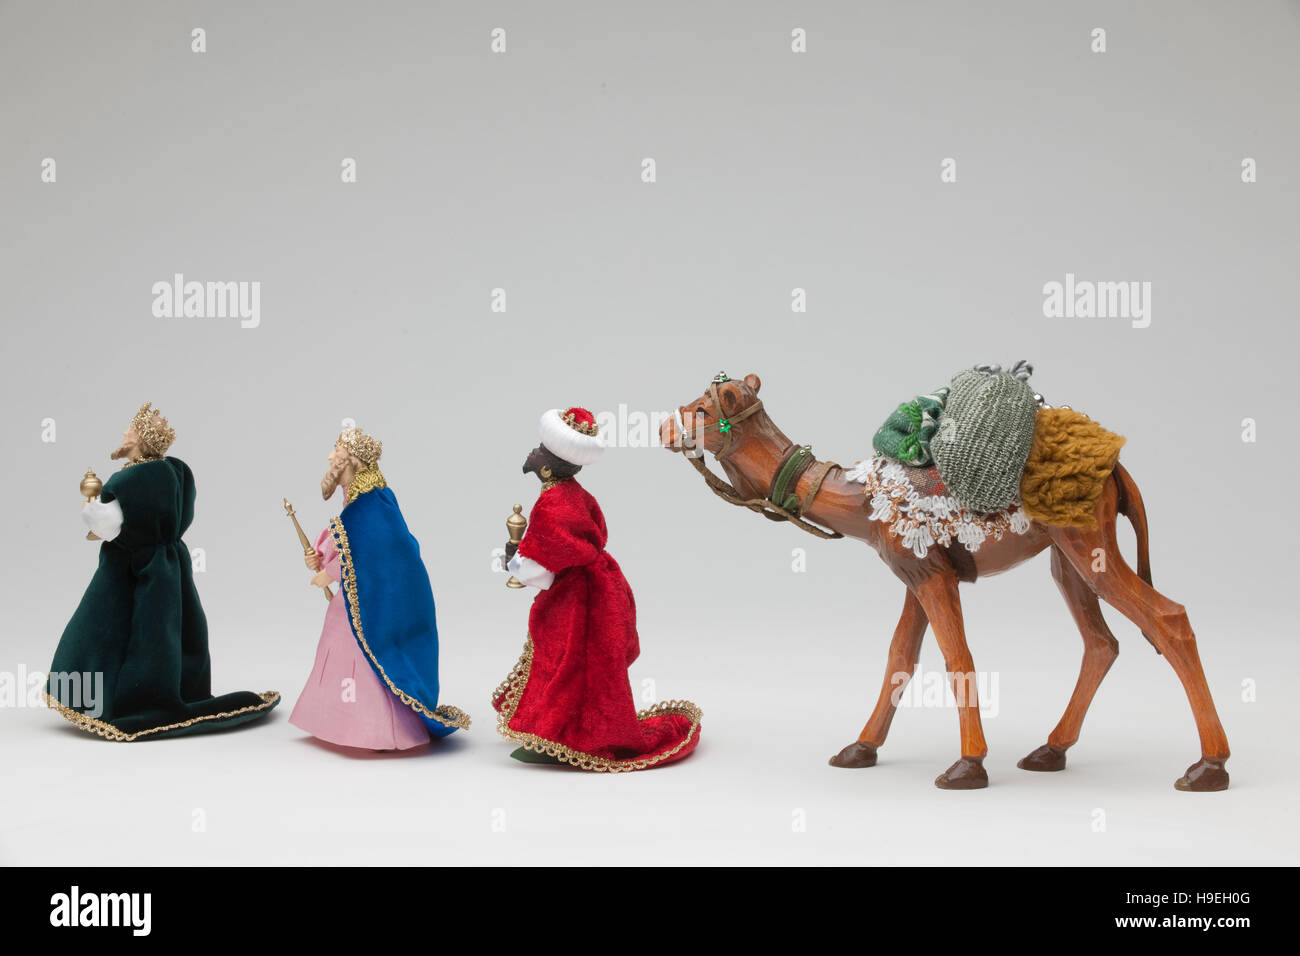 Krippenfiguren der Firma Lang aus Oberammergau, Heilige Drei Begrüssungstrunk Stockbild